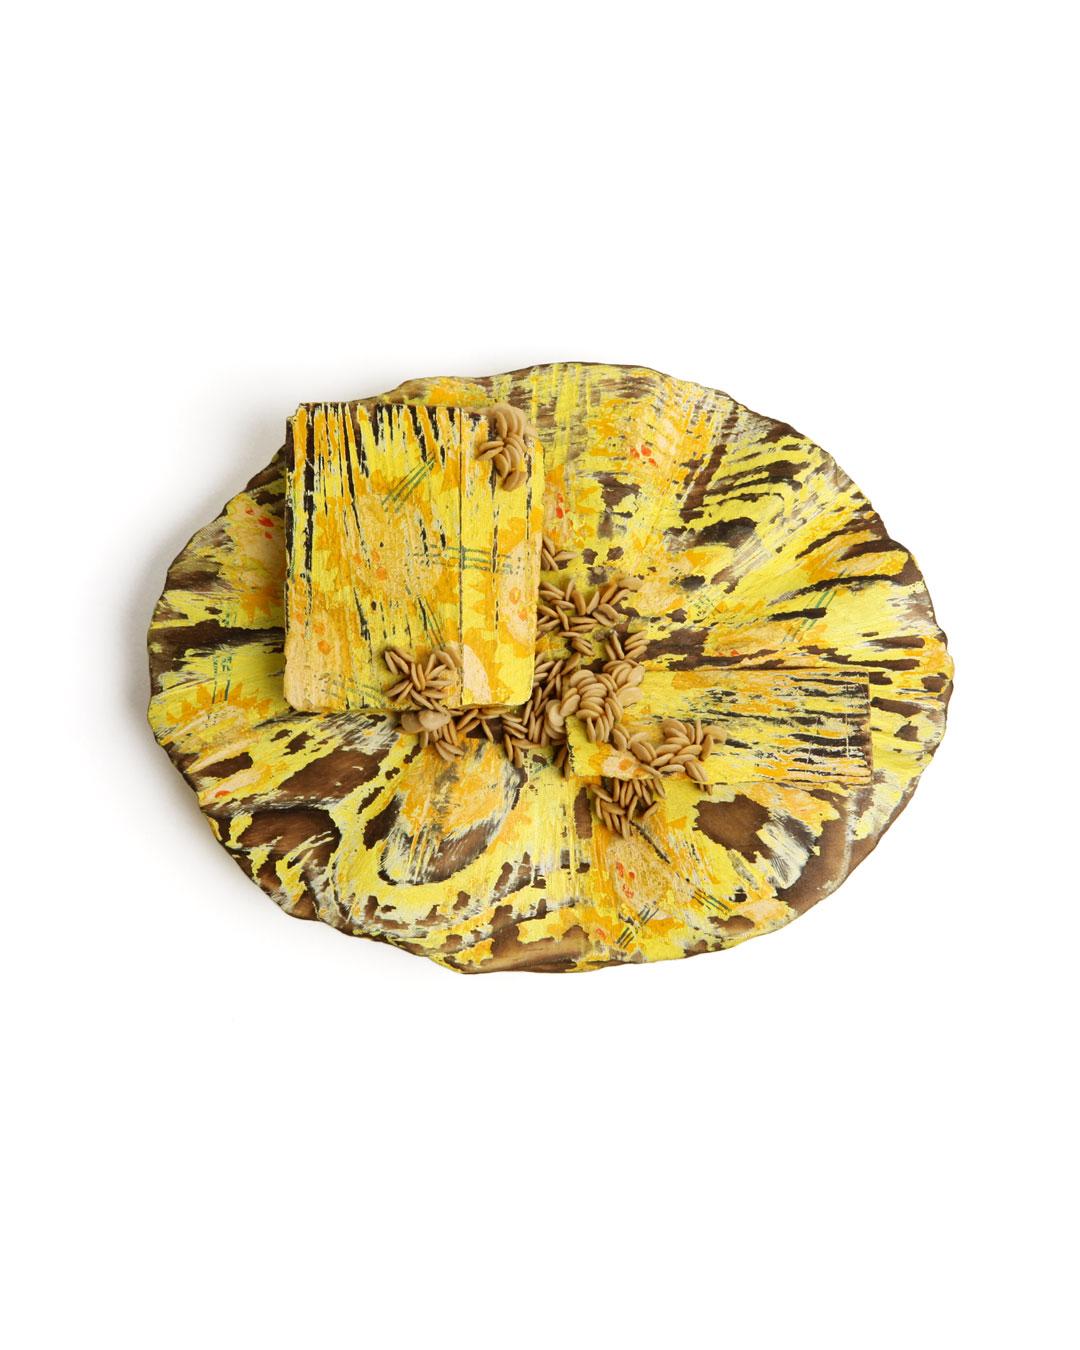 Mari Iwamoto, untitled, 2013, brooch; wood, pepper seeds, paint, silver, 80 x 110 x 30 mm, €970